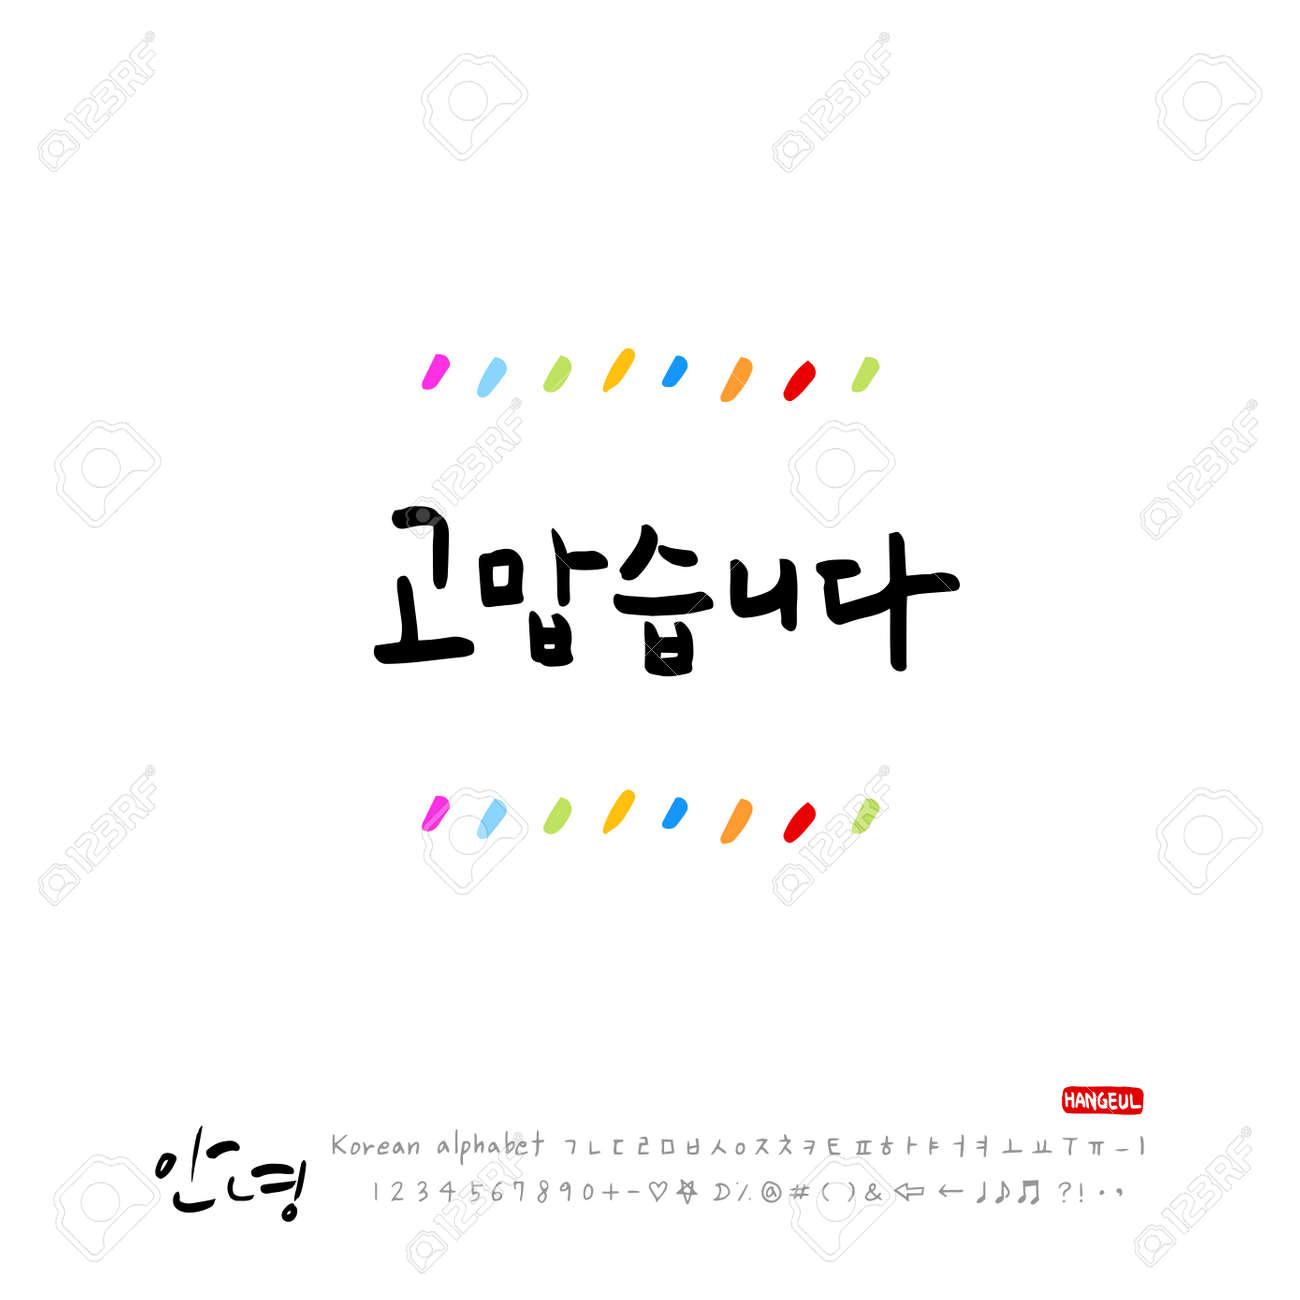 Handwritten calligraphy beautiful korean greeting hello vector handwritten calligraphy beautiful korean greeting hello vector illustration stock vector 94656548 m4hsunfo